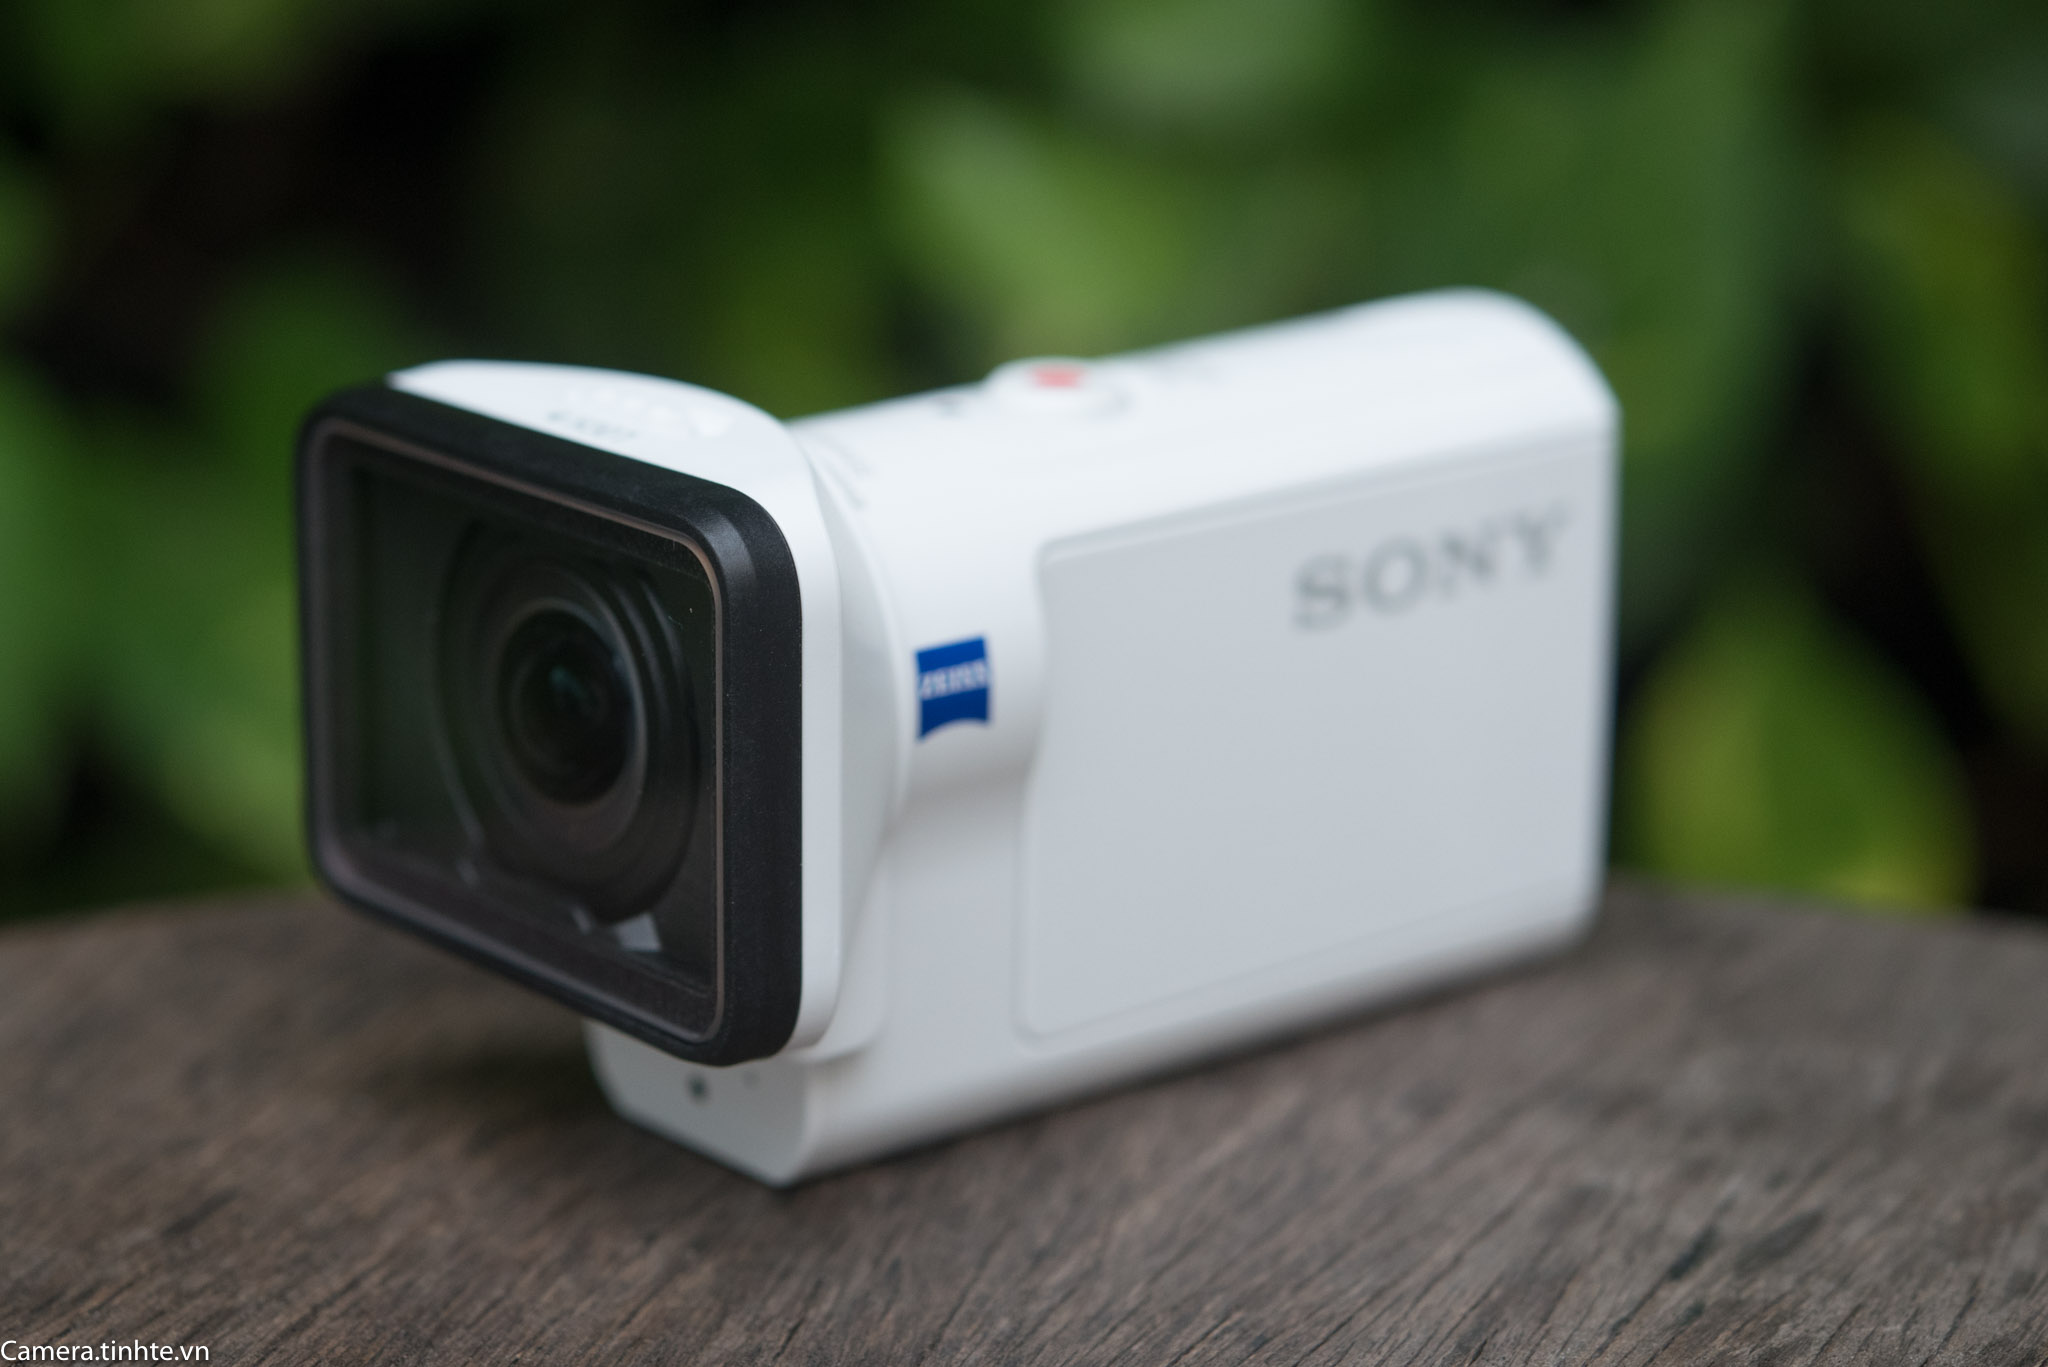 Phu kien Sony FDR-X3000 - Camera.tinhte.vn -1.jpg